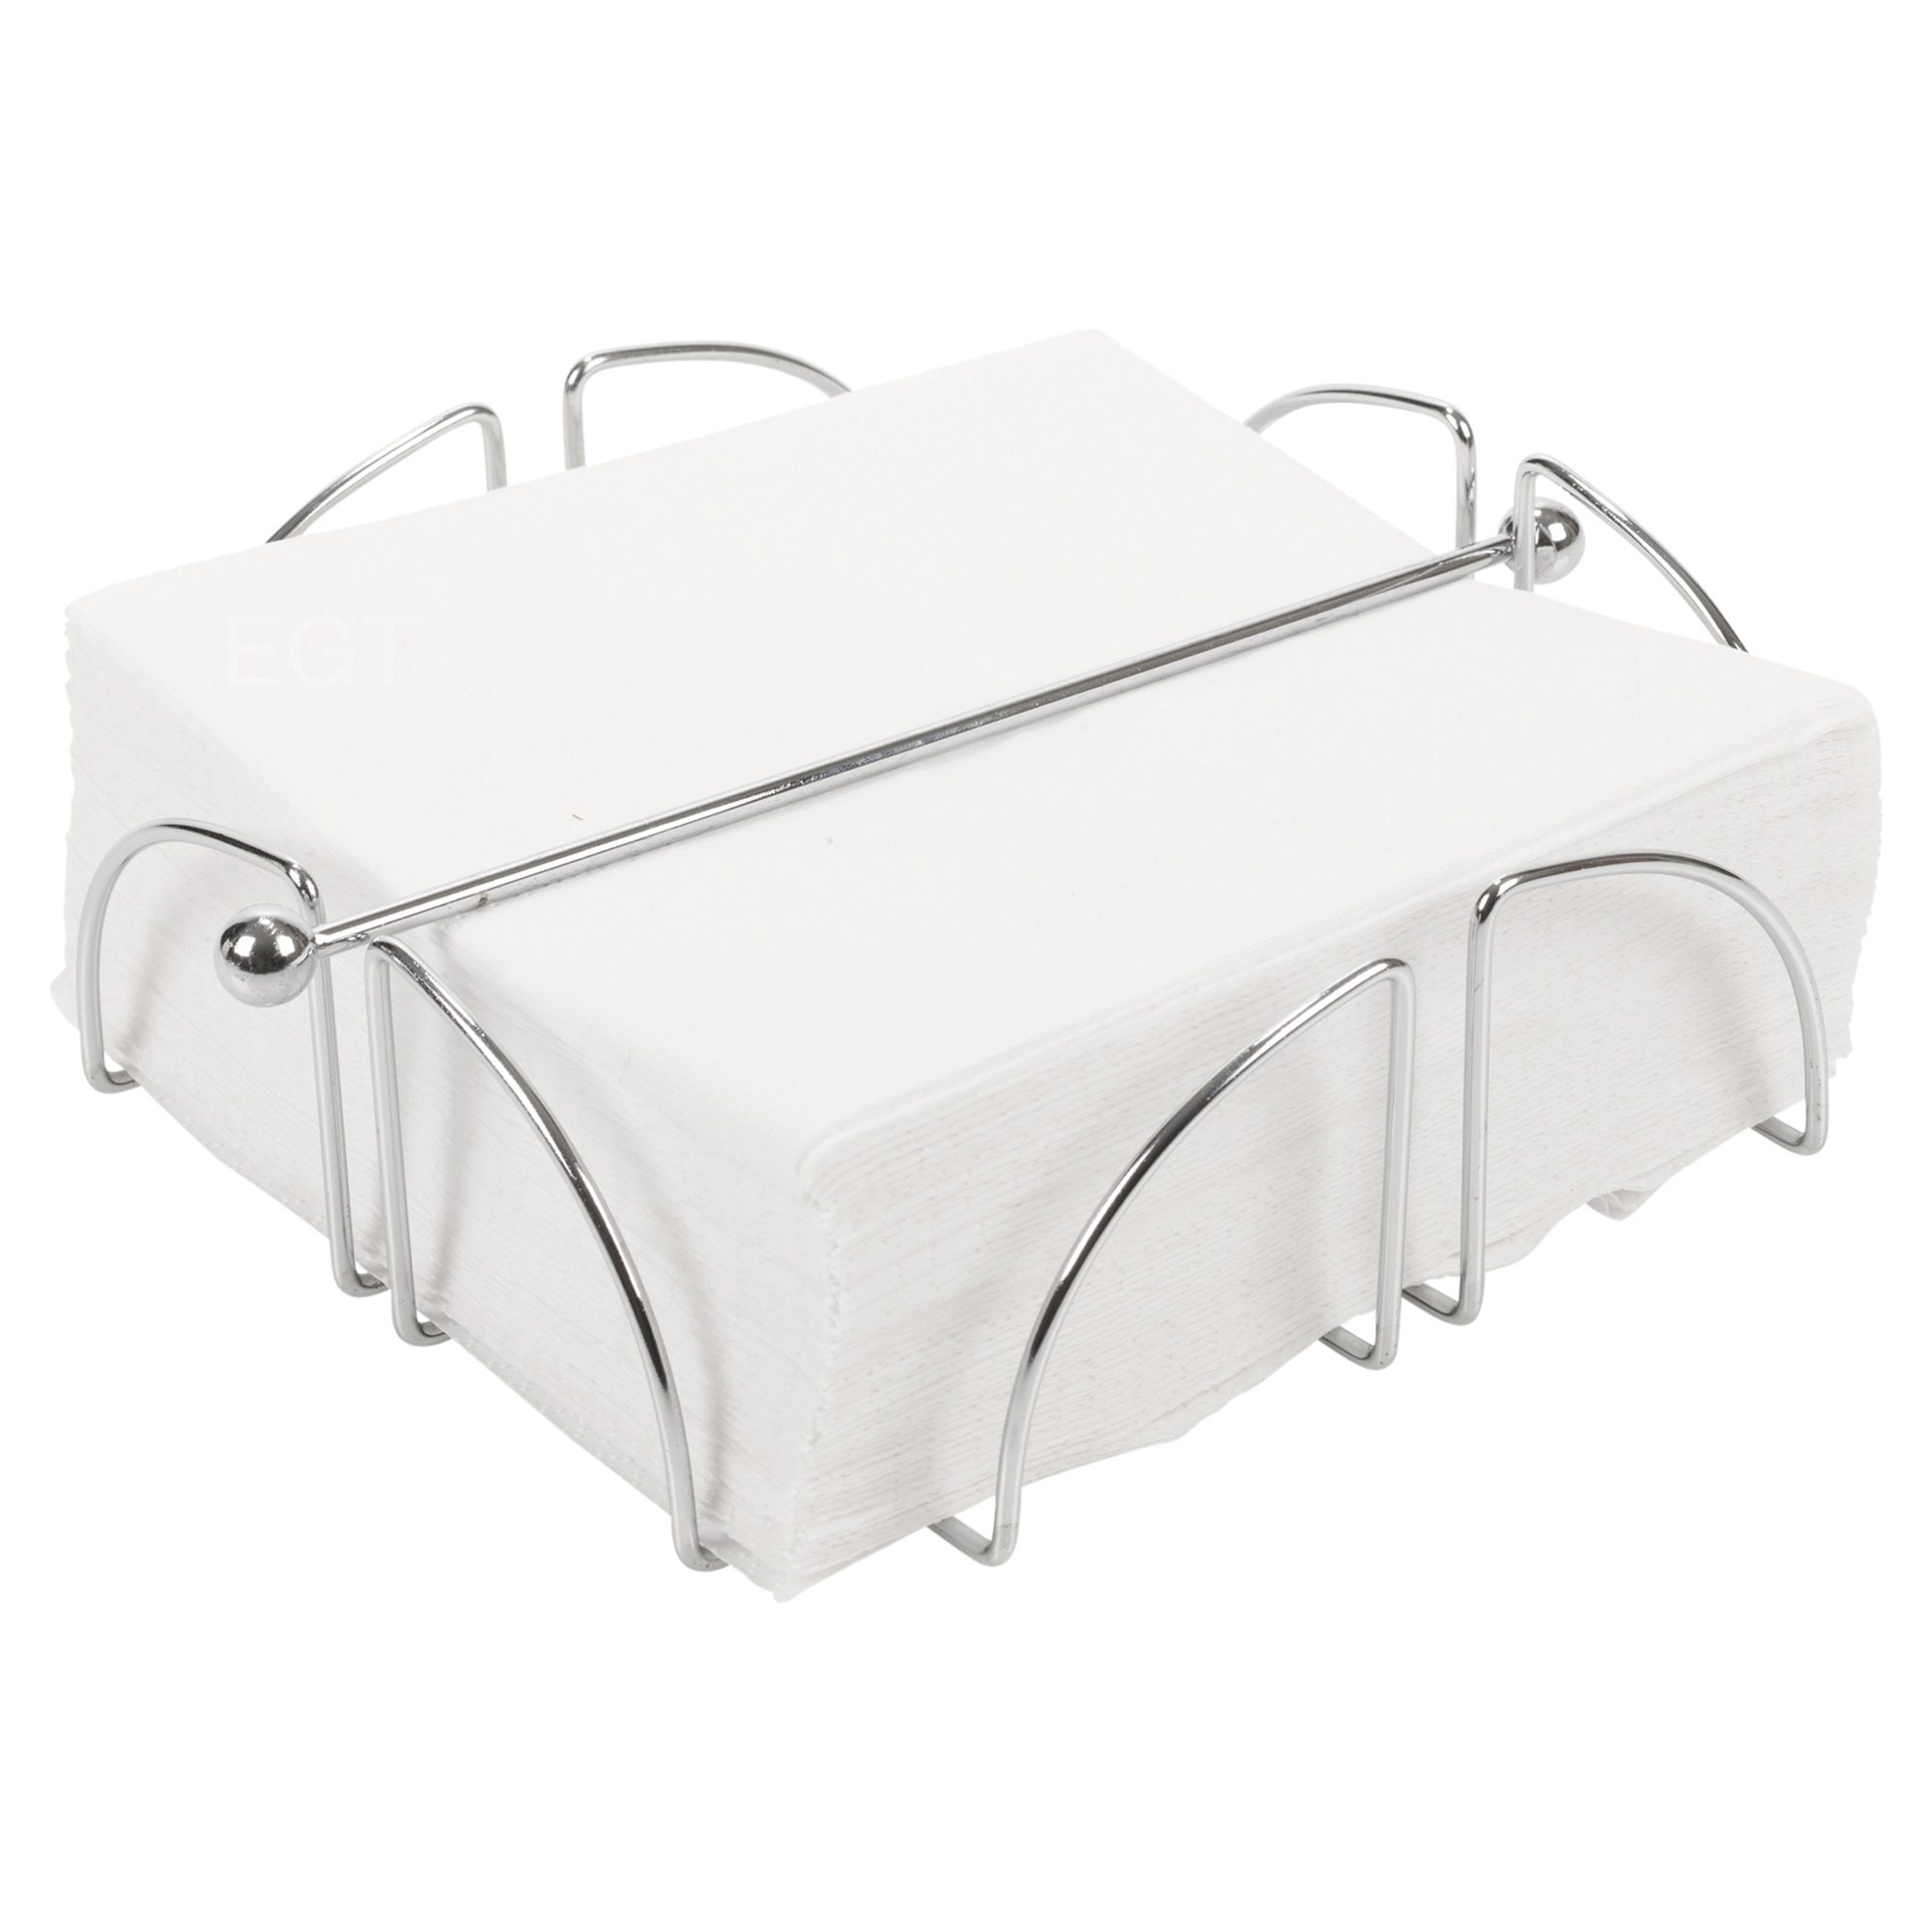 Napkin Rings Holders Chrome Wire Serviette Napkin Holder Dispenser Kitchen Dining Room Table Decor Home Furniture Diy Omnitel Com Na